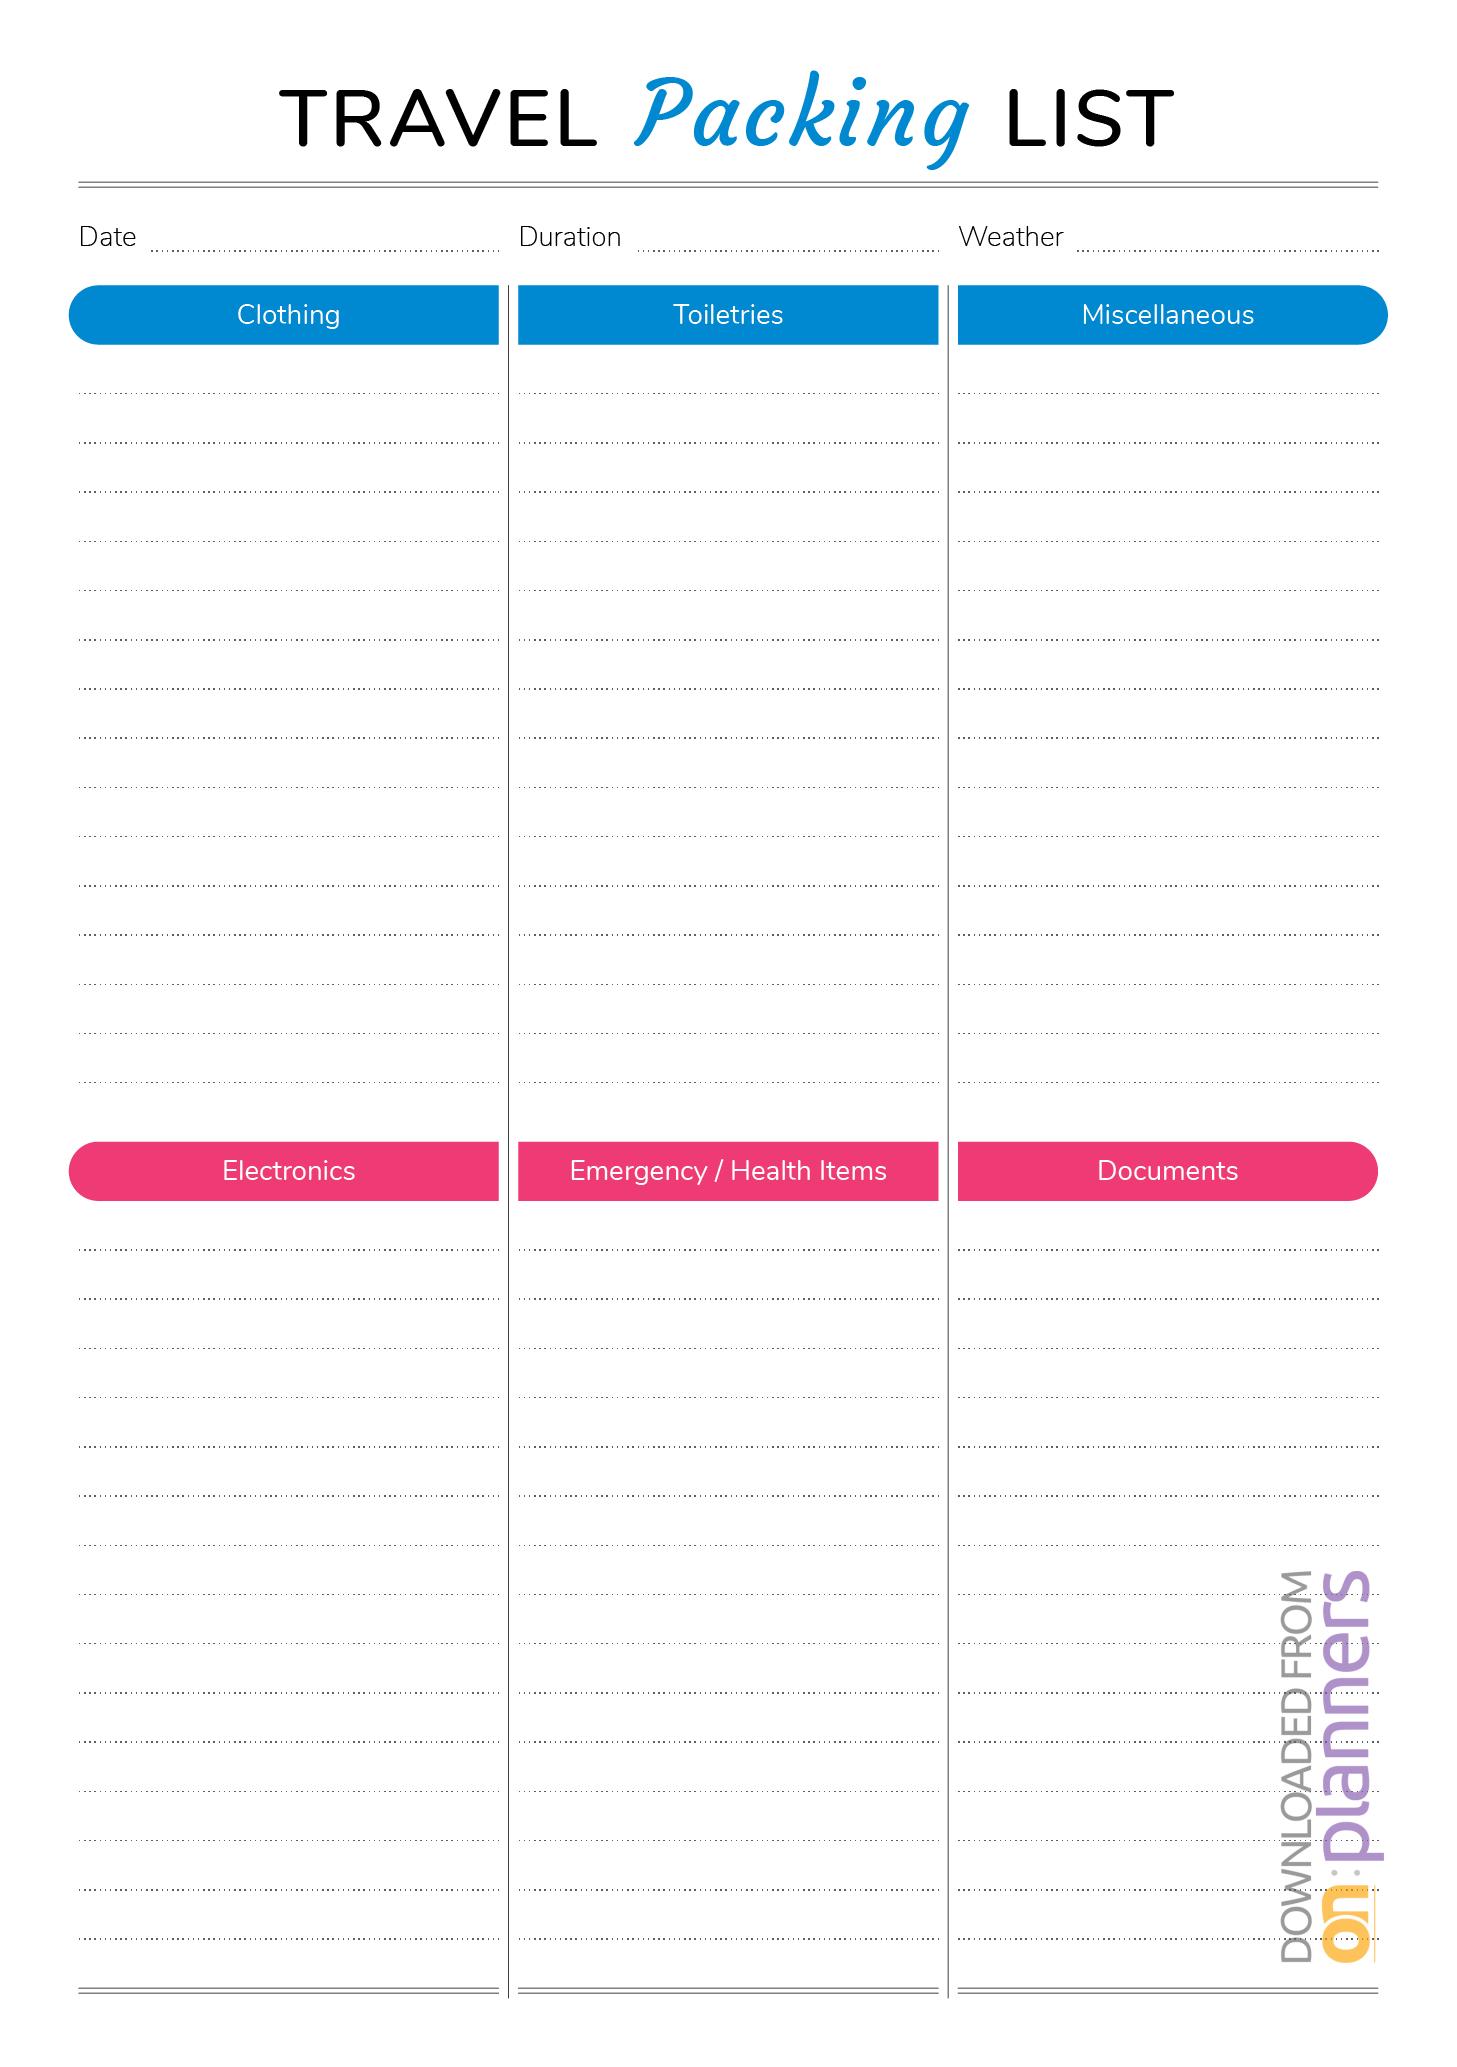 Download Printable Travel Packing List Pdf regarding Blank Packing List Template